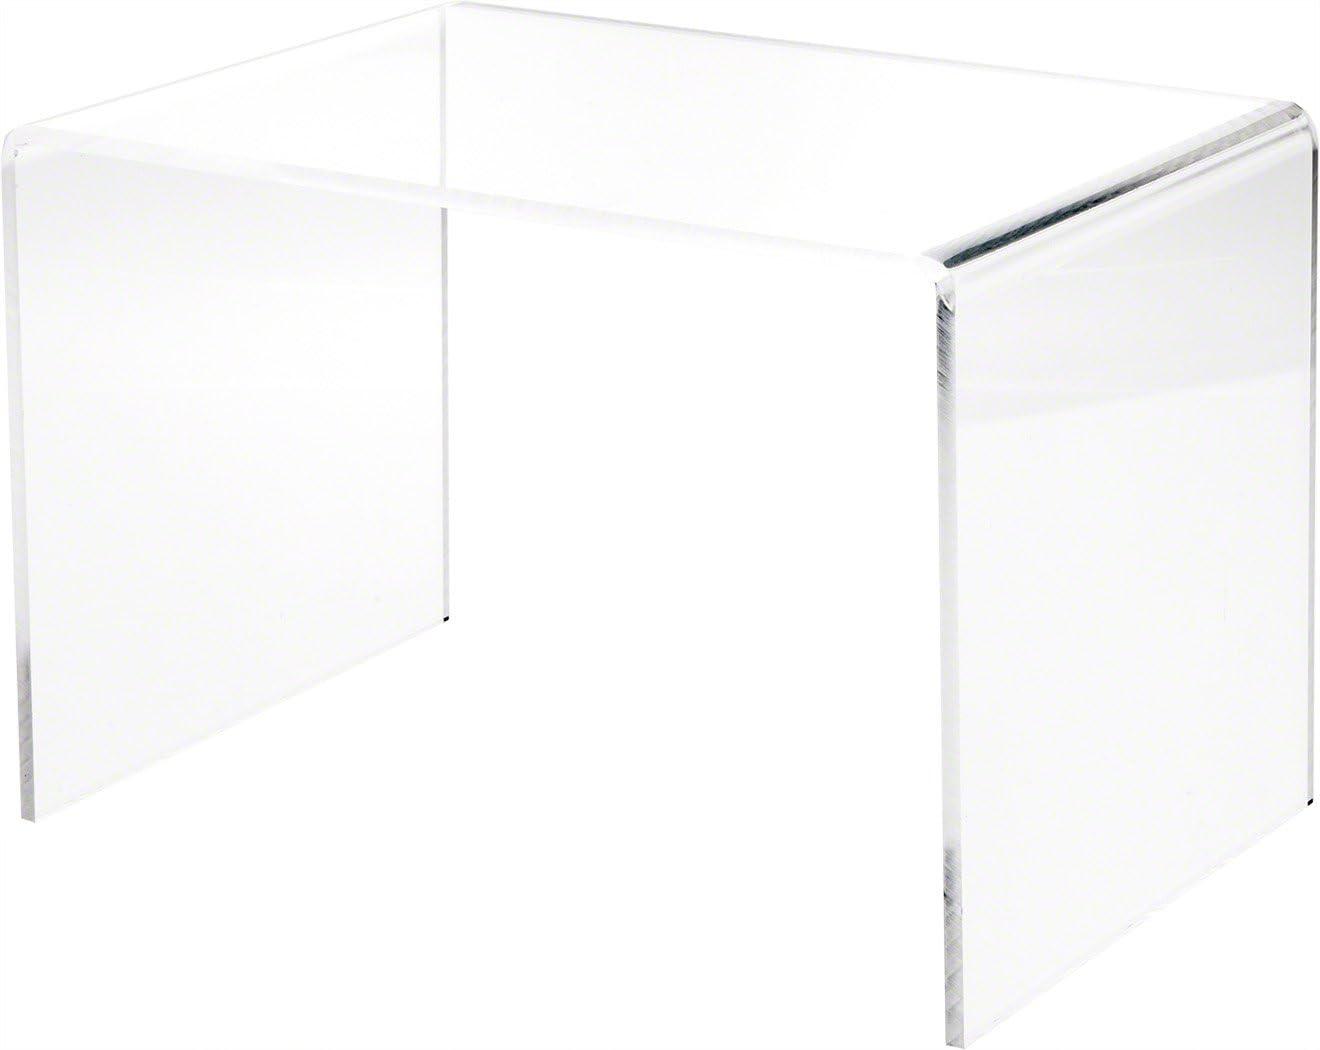 Plymor Clear Acrylic Rectangular Display Riser Height inch Dallas Mall x Max 67% OFF 8